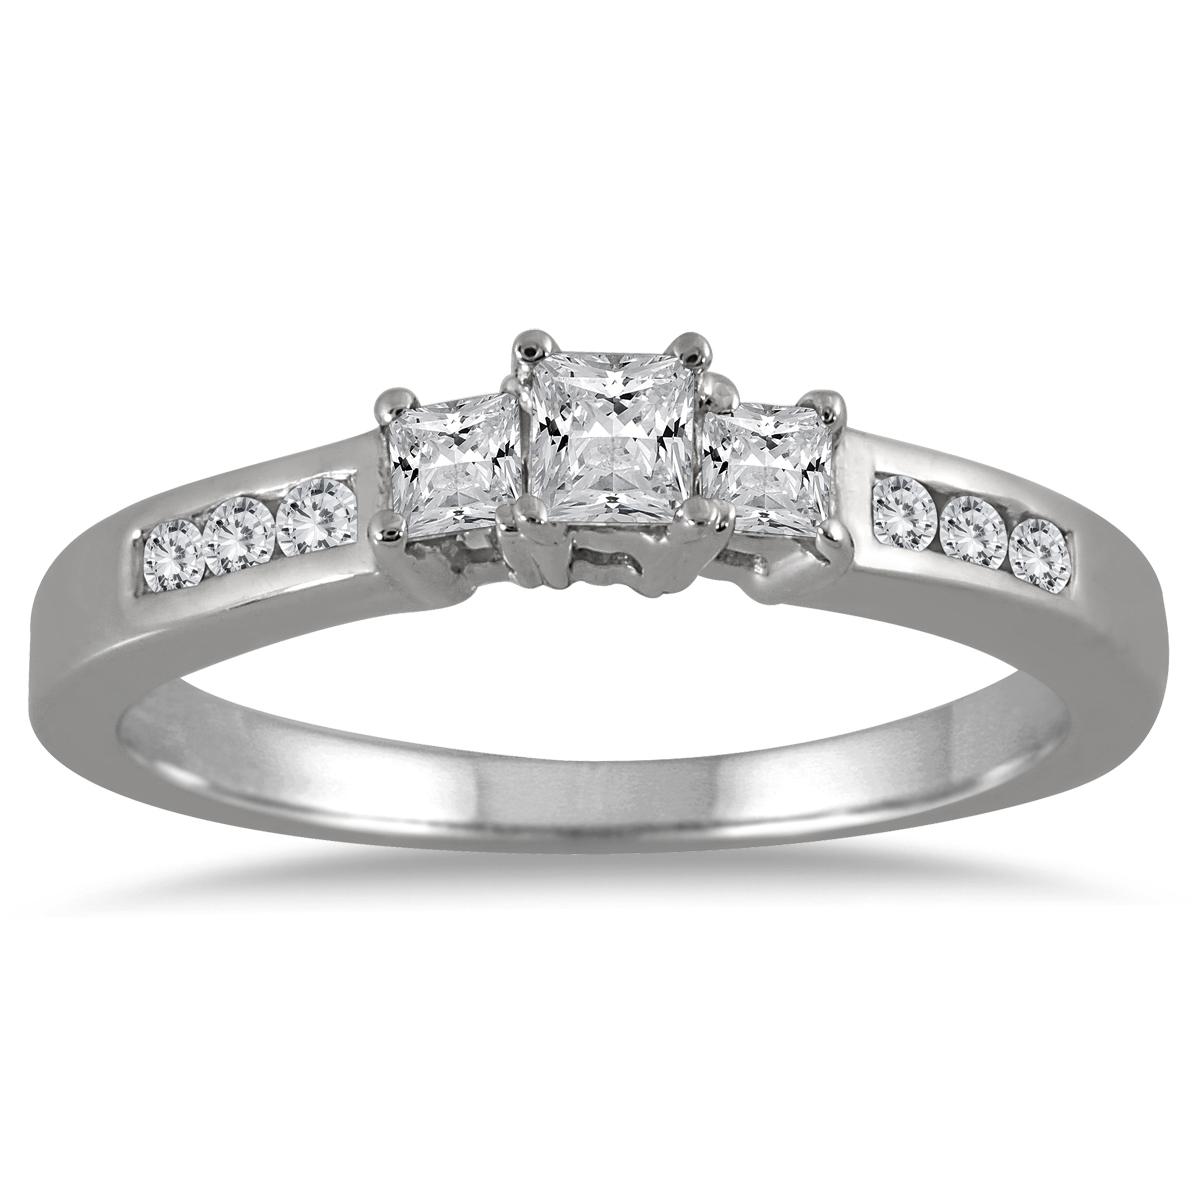 1/2 Carat TW Princess Cut Diamond Three